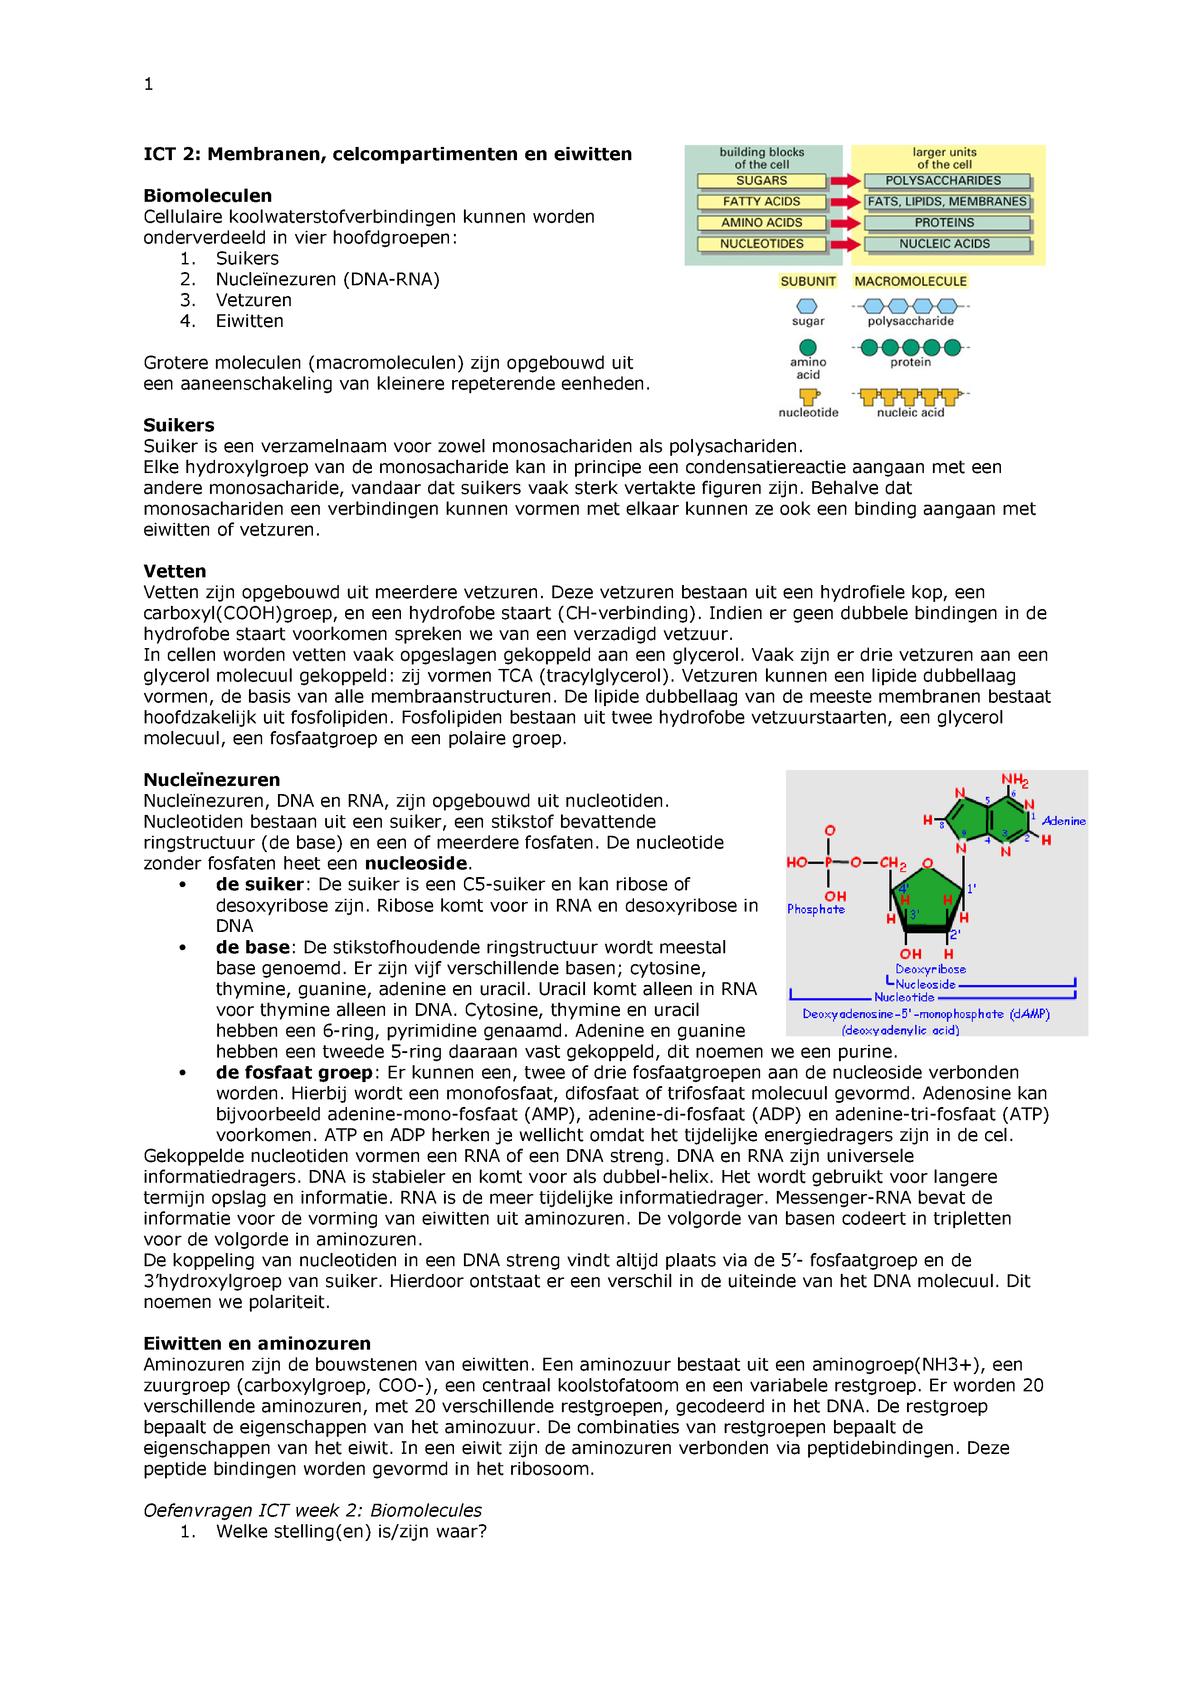 Ict Week 2 Cell Biology Cbi 10306 Studeersnel